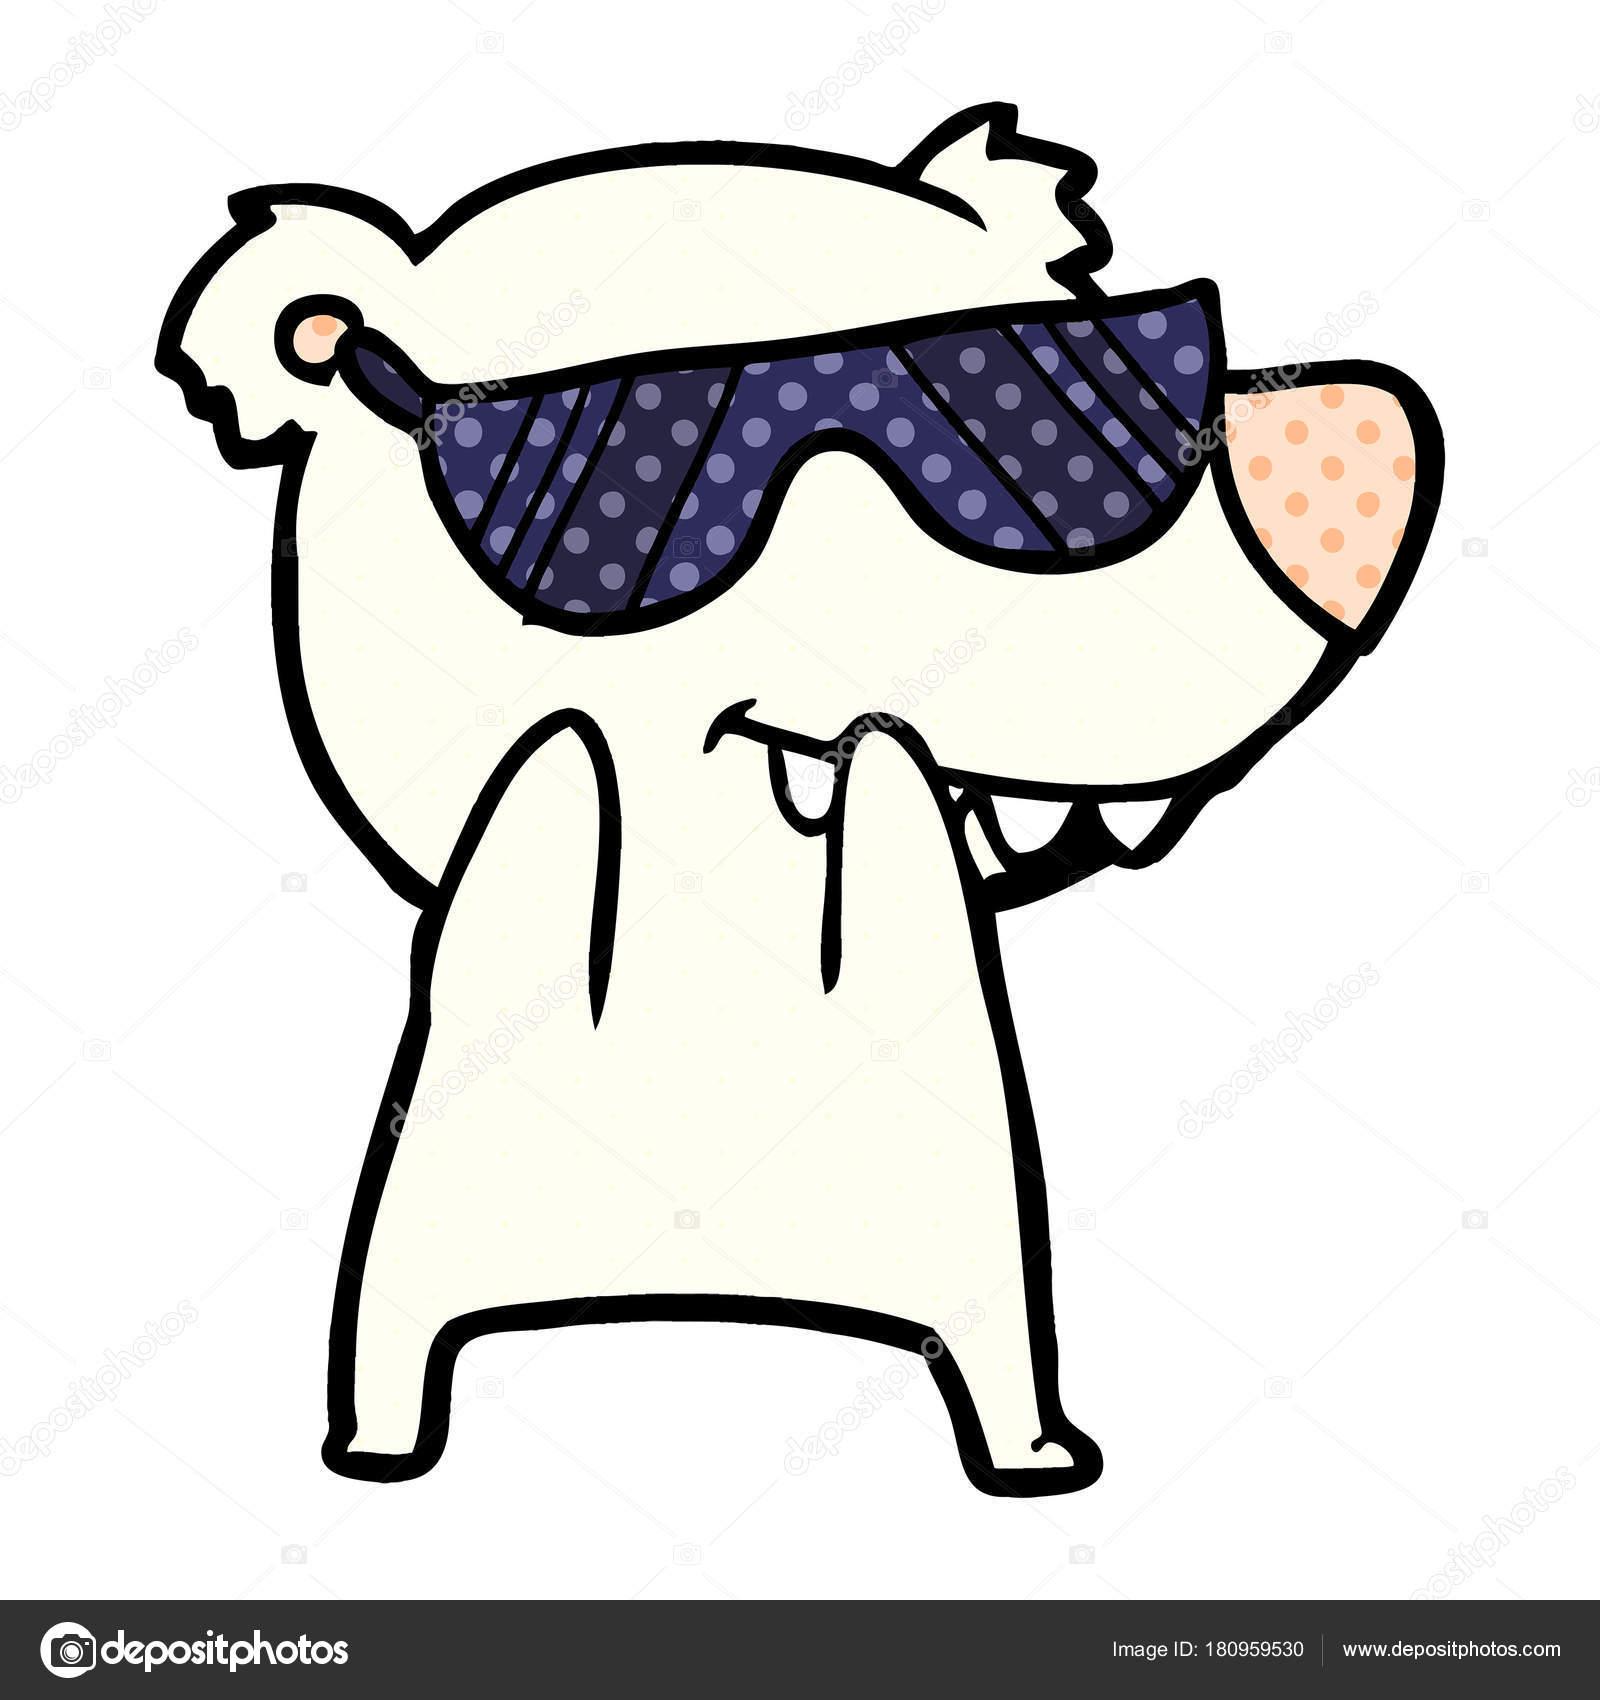 ba528e2ba0 Κινούμενα Σχέδια Αρκούδα Φορώντας Γυαλιά Ηλίου — Διανυσματικό Αρχείο ...